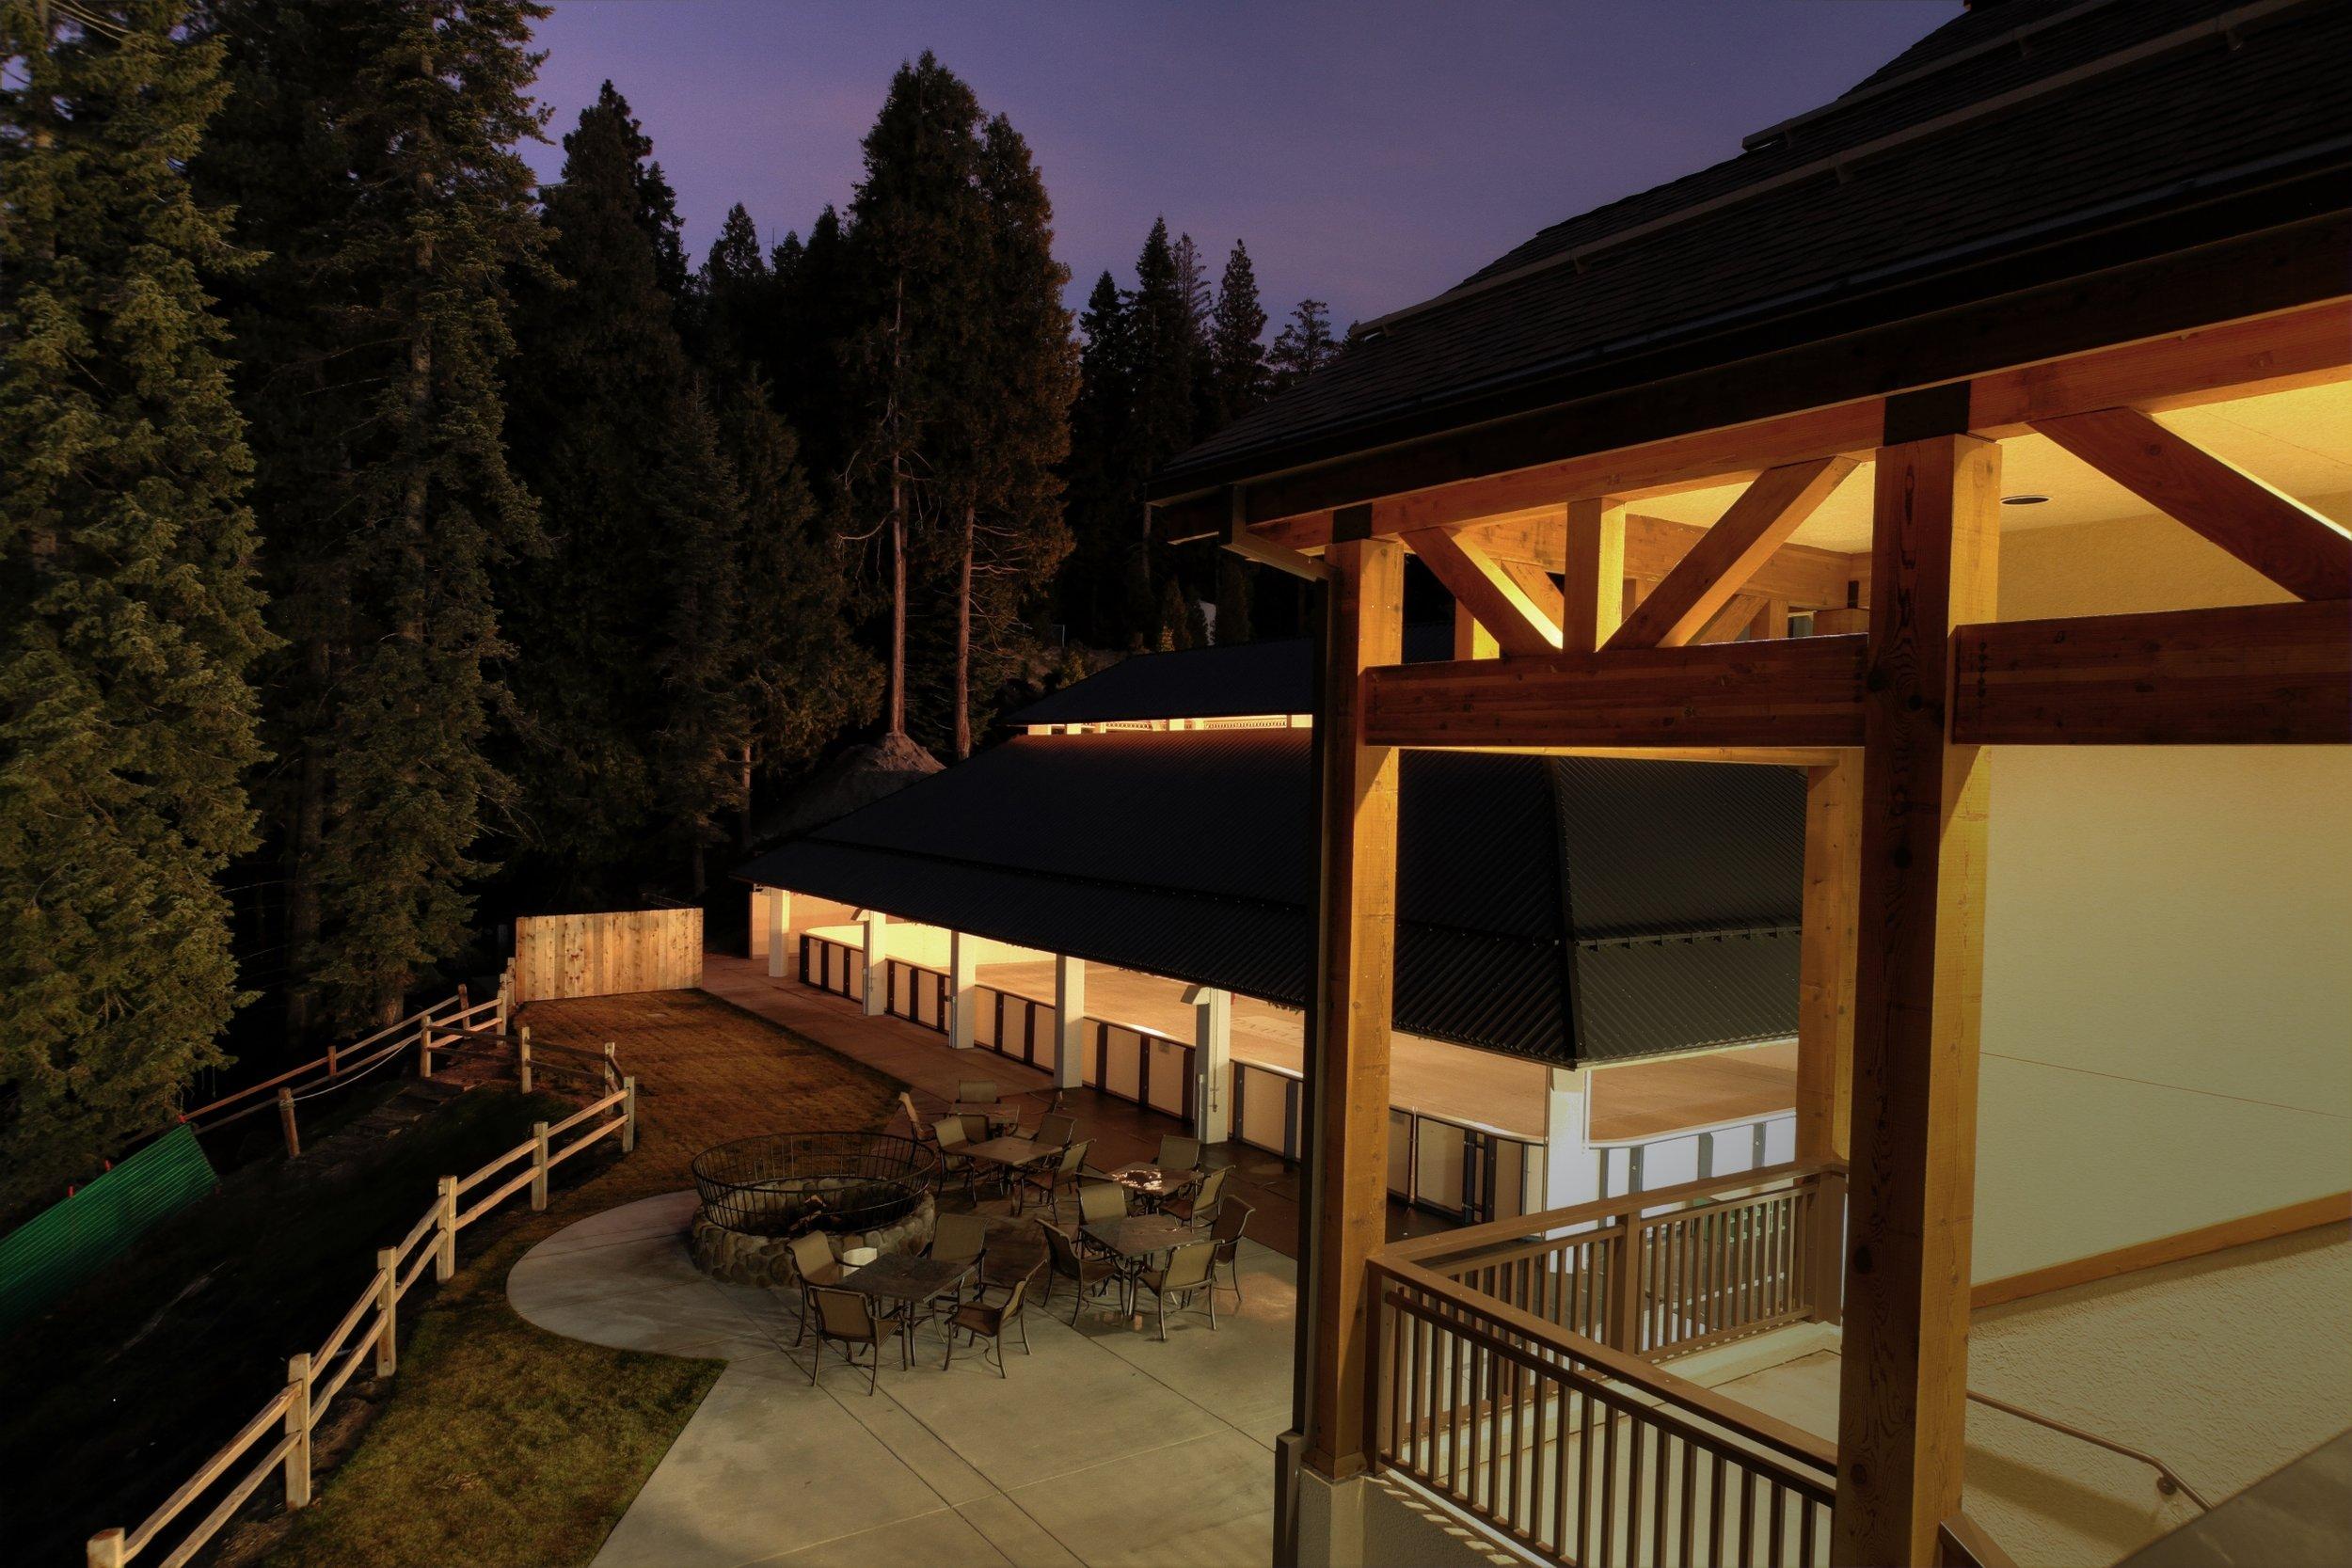 Tenaya Lodge-Yosemite 362.jpg